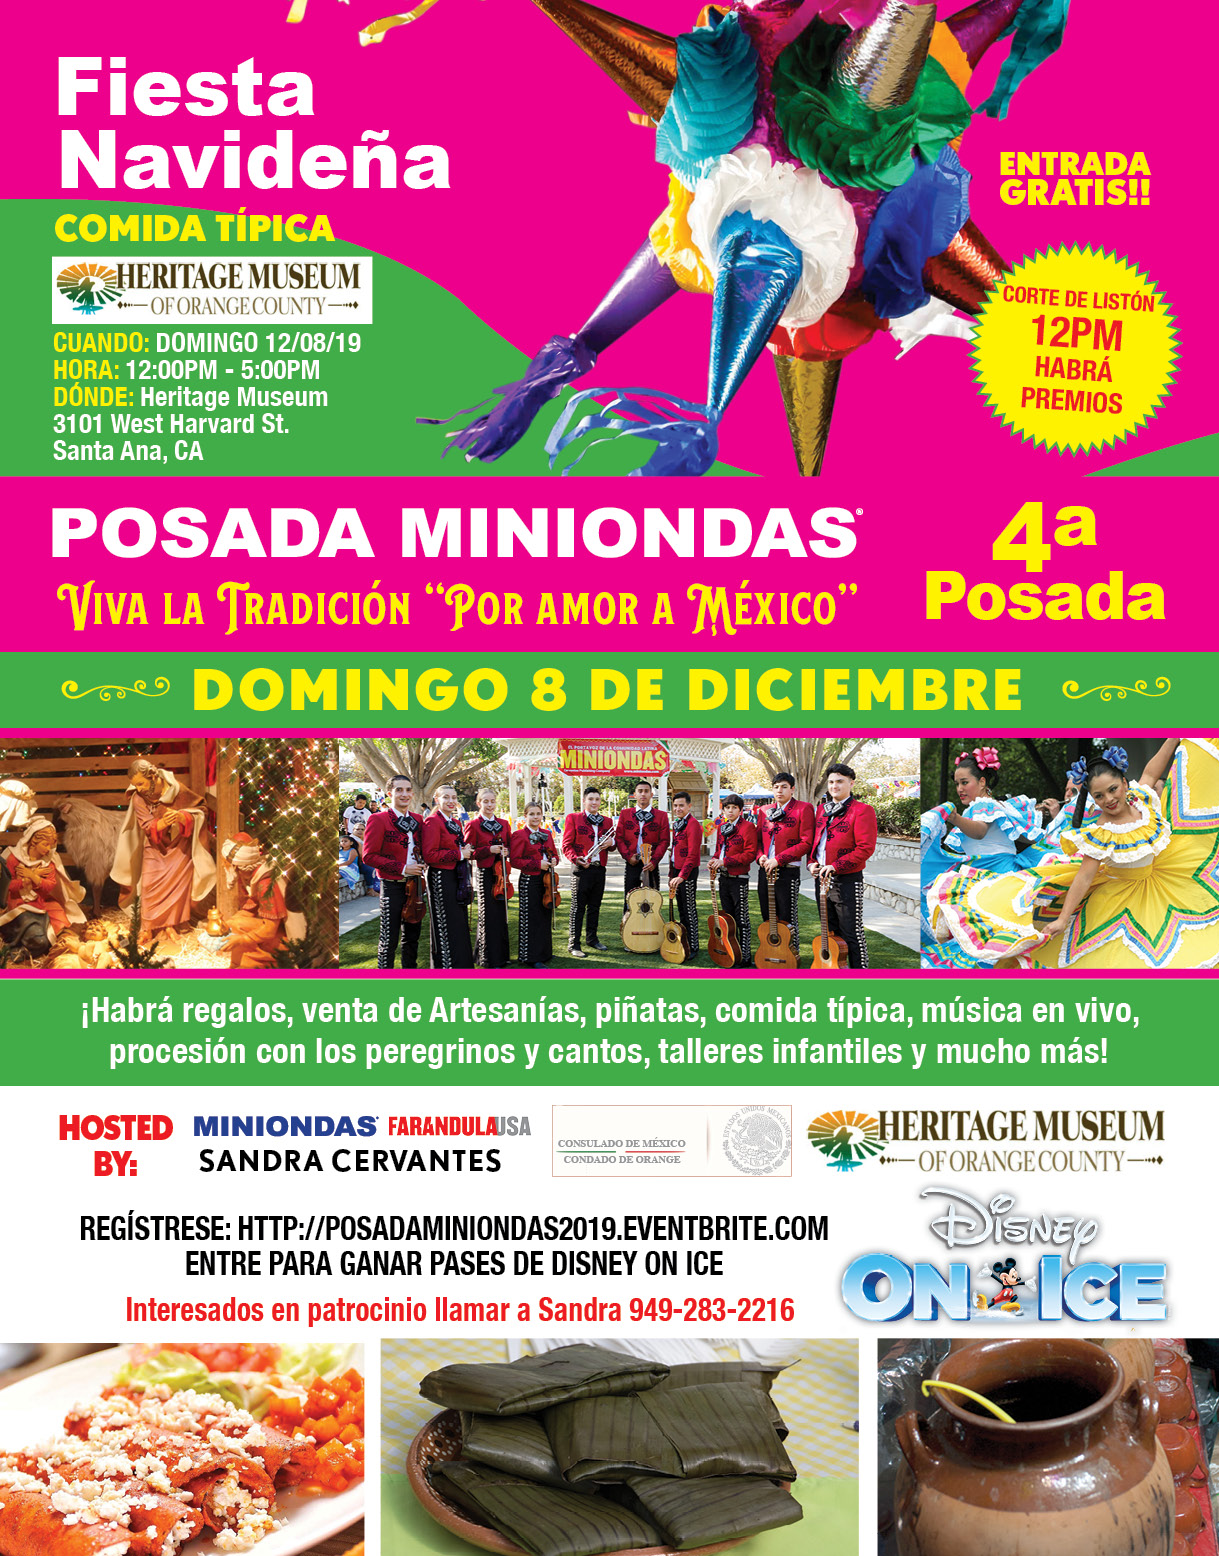 Posada Miniondas 2019